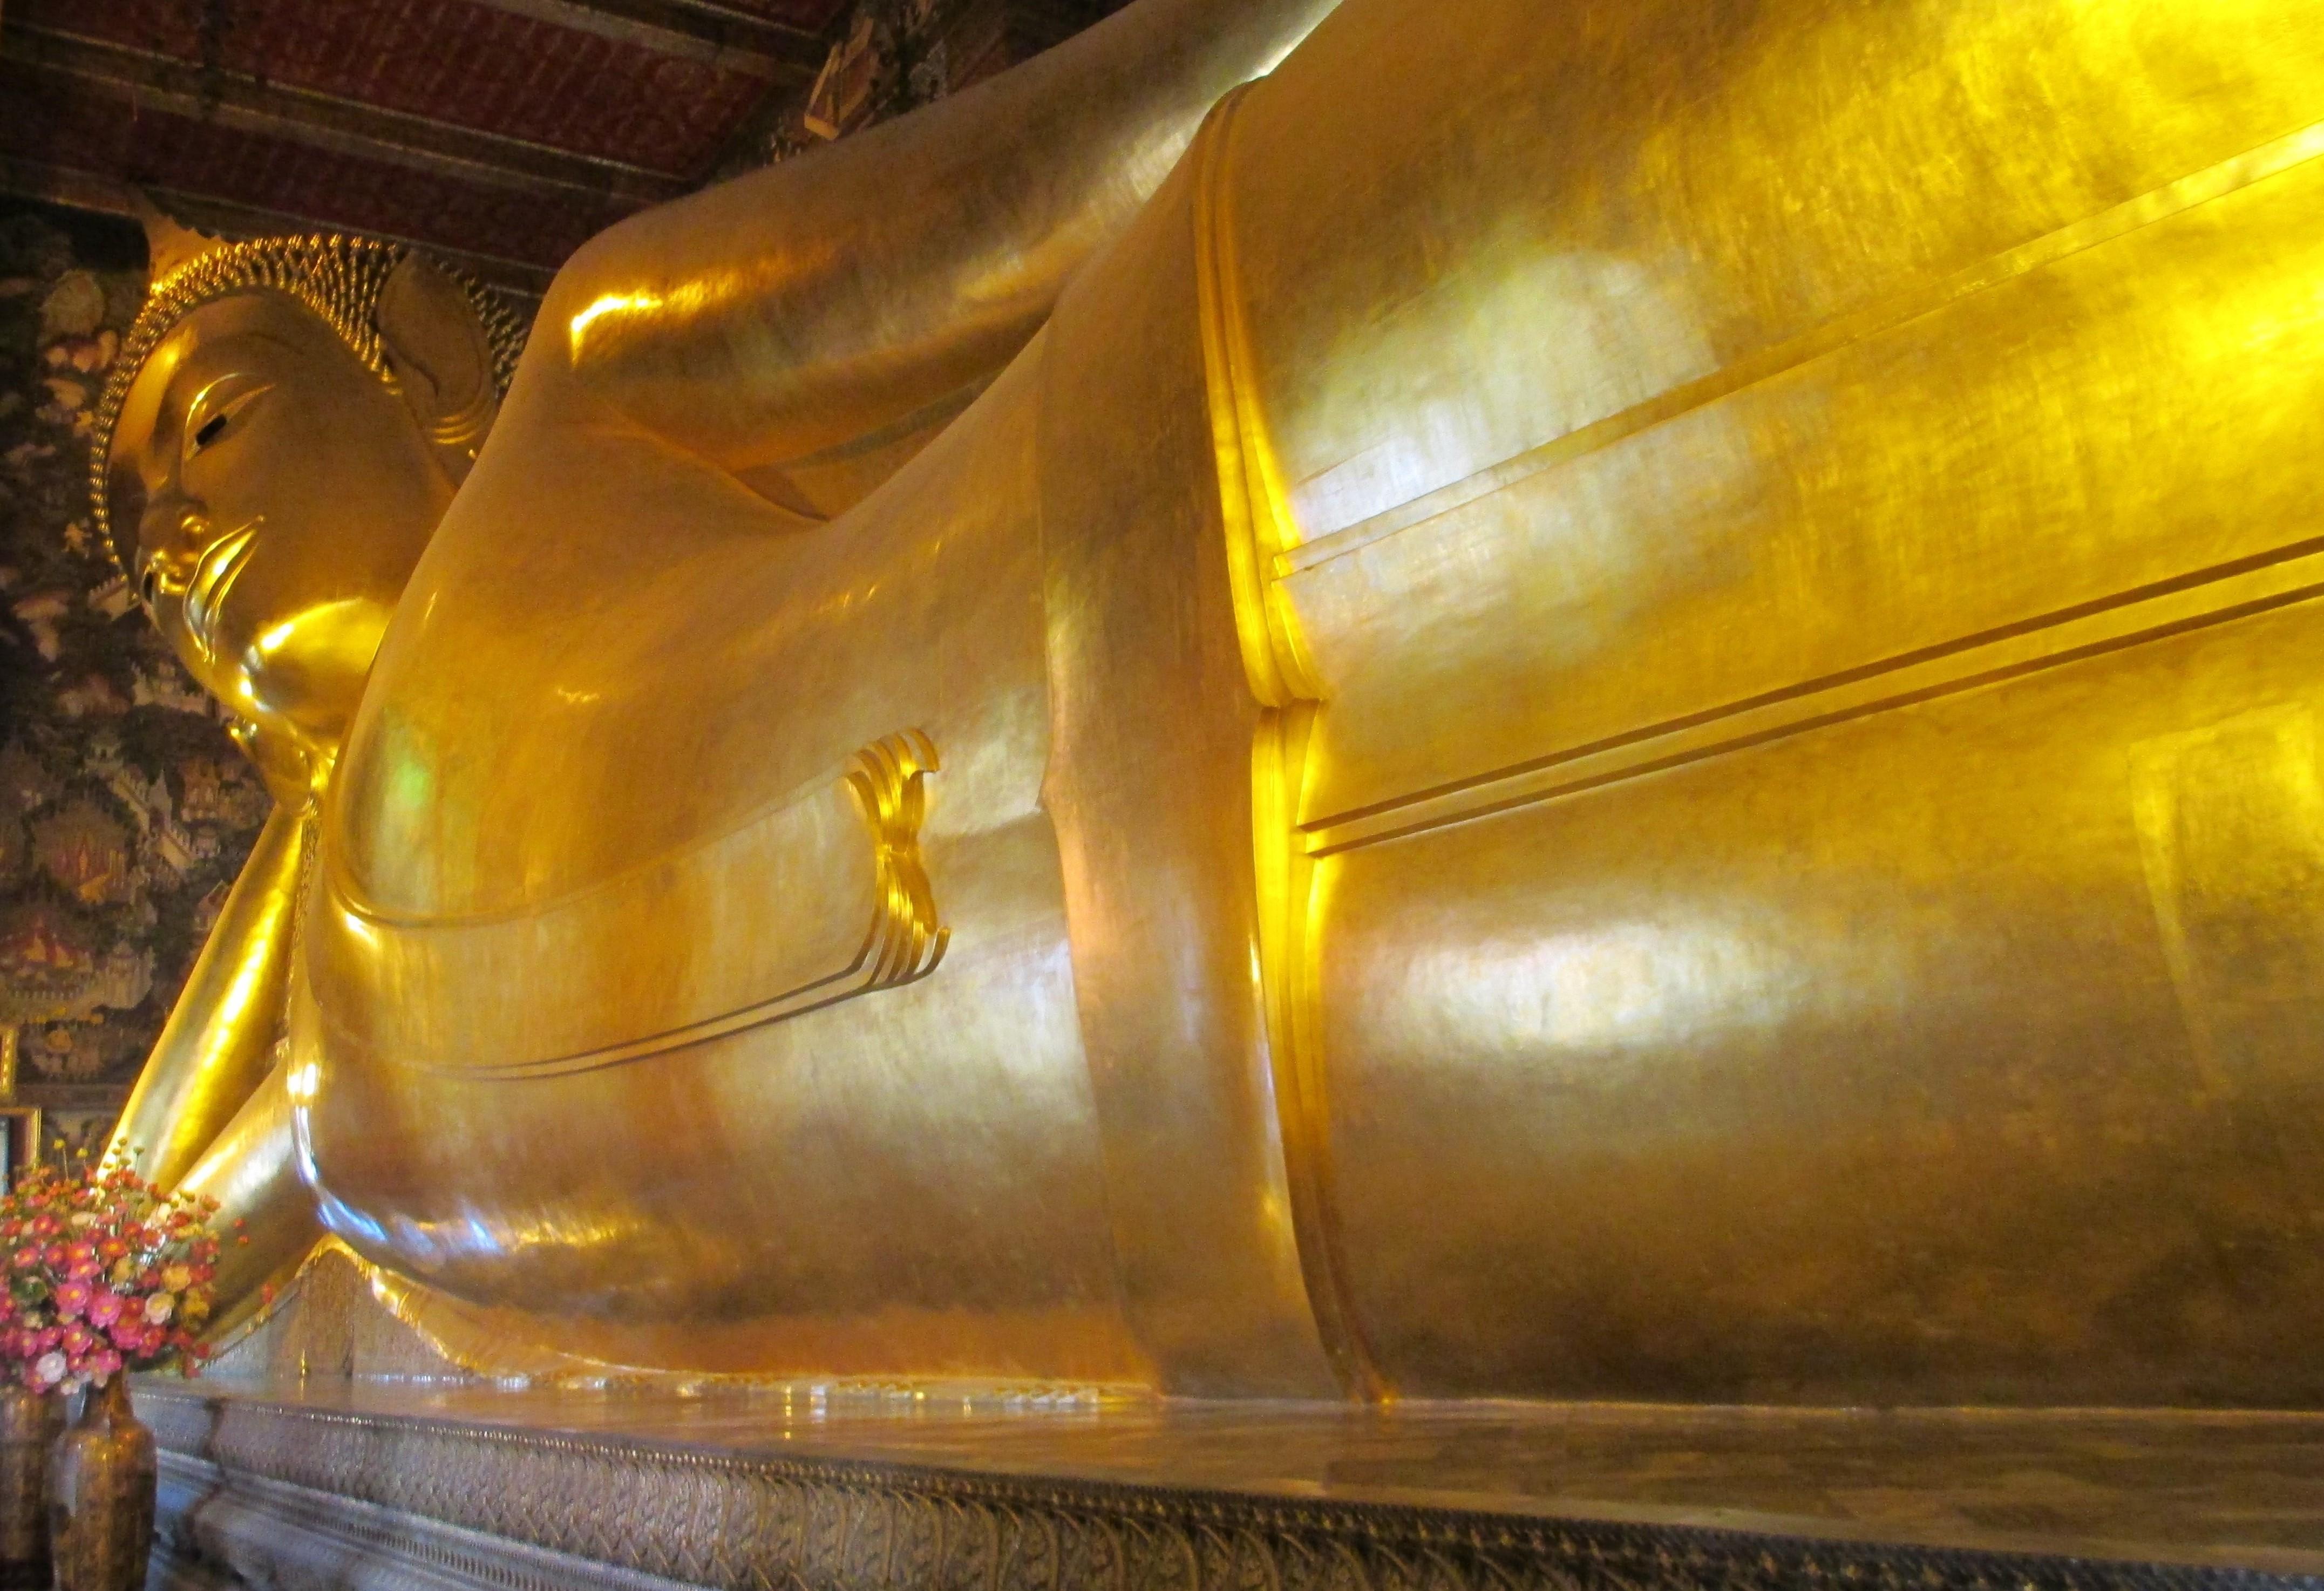 Reclining Buddha, Buddha, temples, bangkok, thailand, Wat Pho,